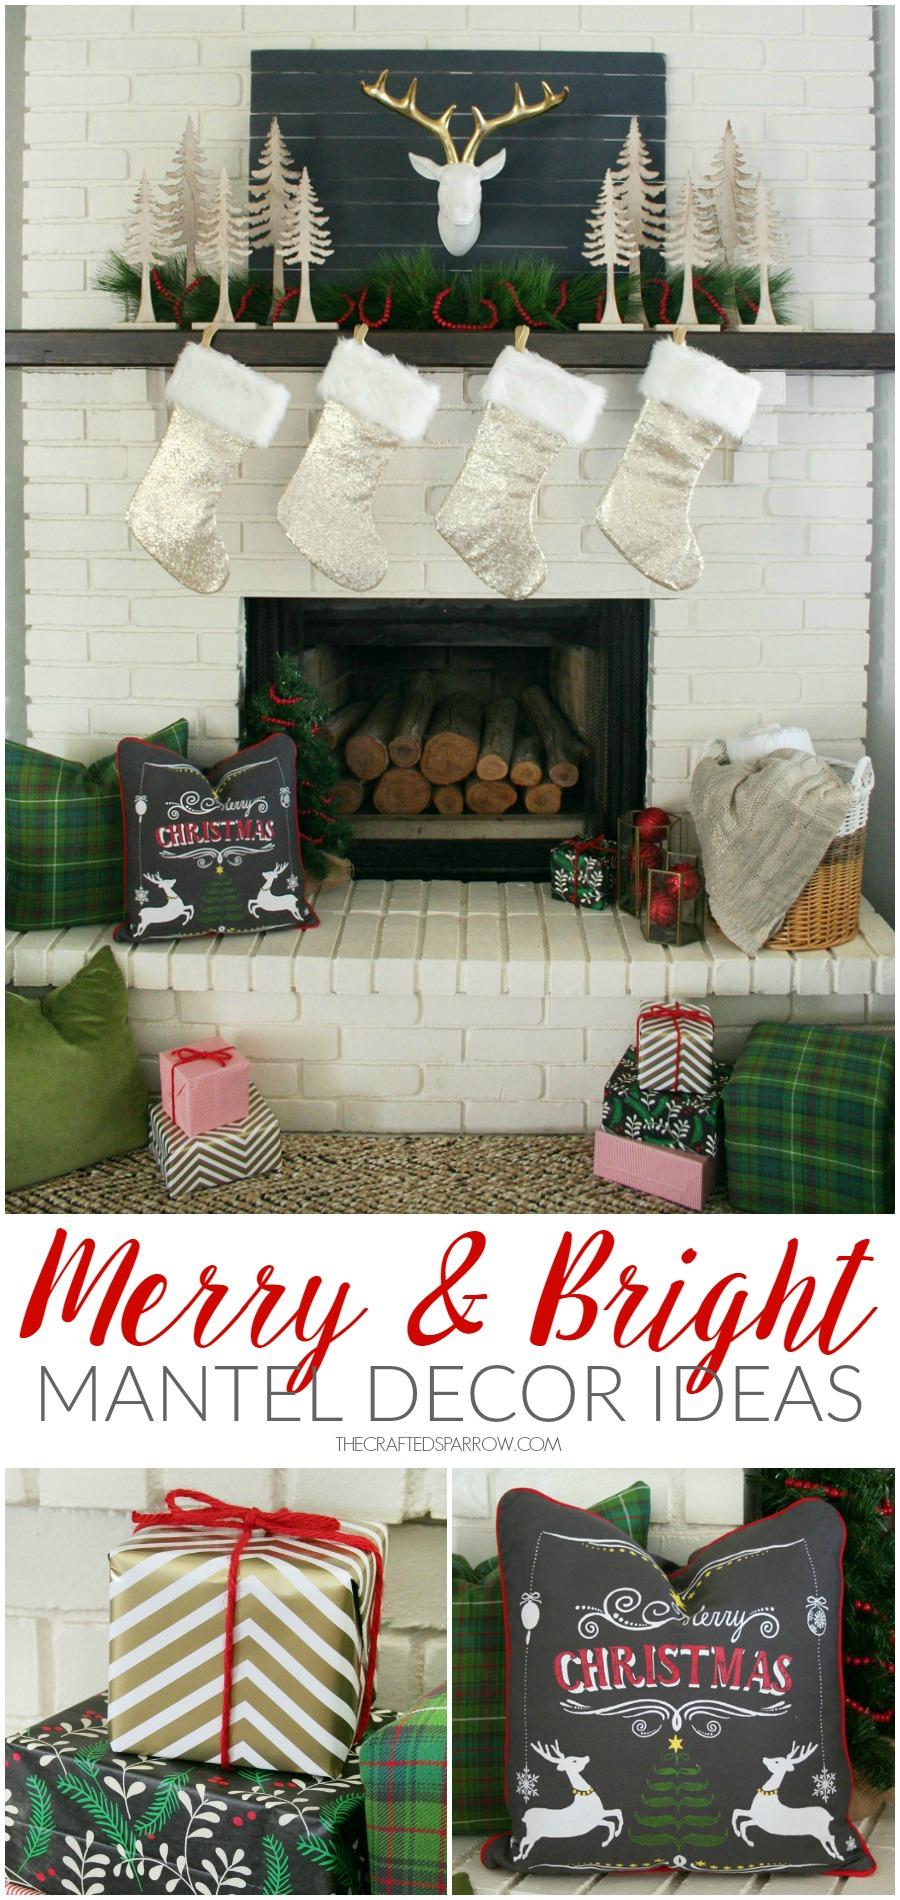 Merry & Bright Holiday Mantel